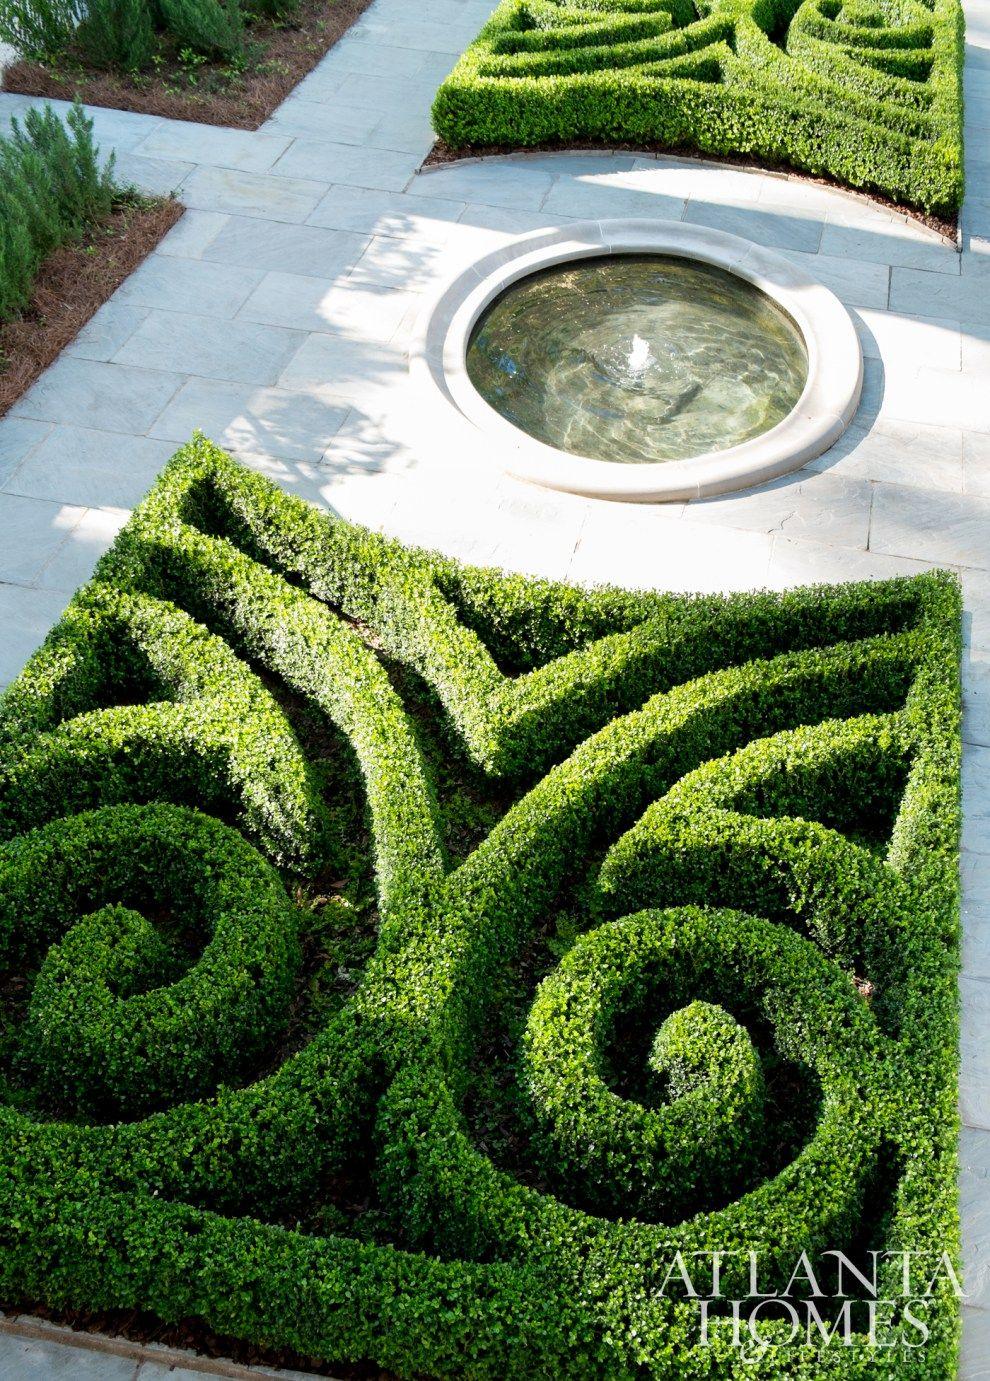 Landscape architect atlanta ga - Evans Cucich Hayden House Atlanta Ga Images Courtesy Of Atlanta Homes Landscape Architecture